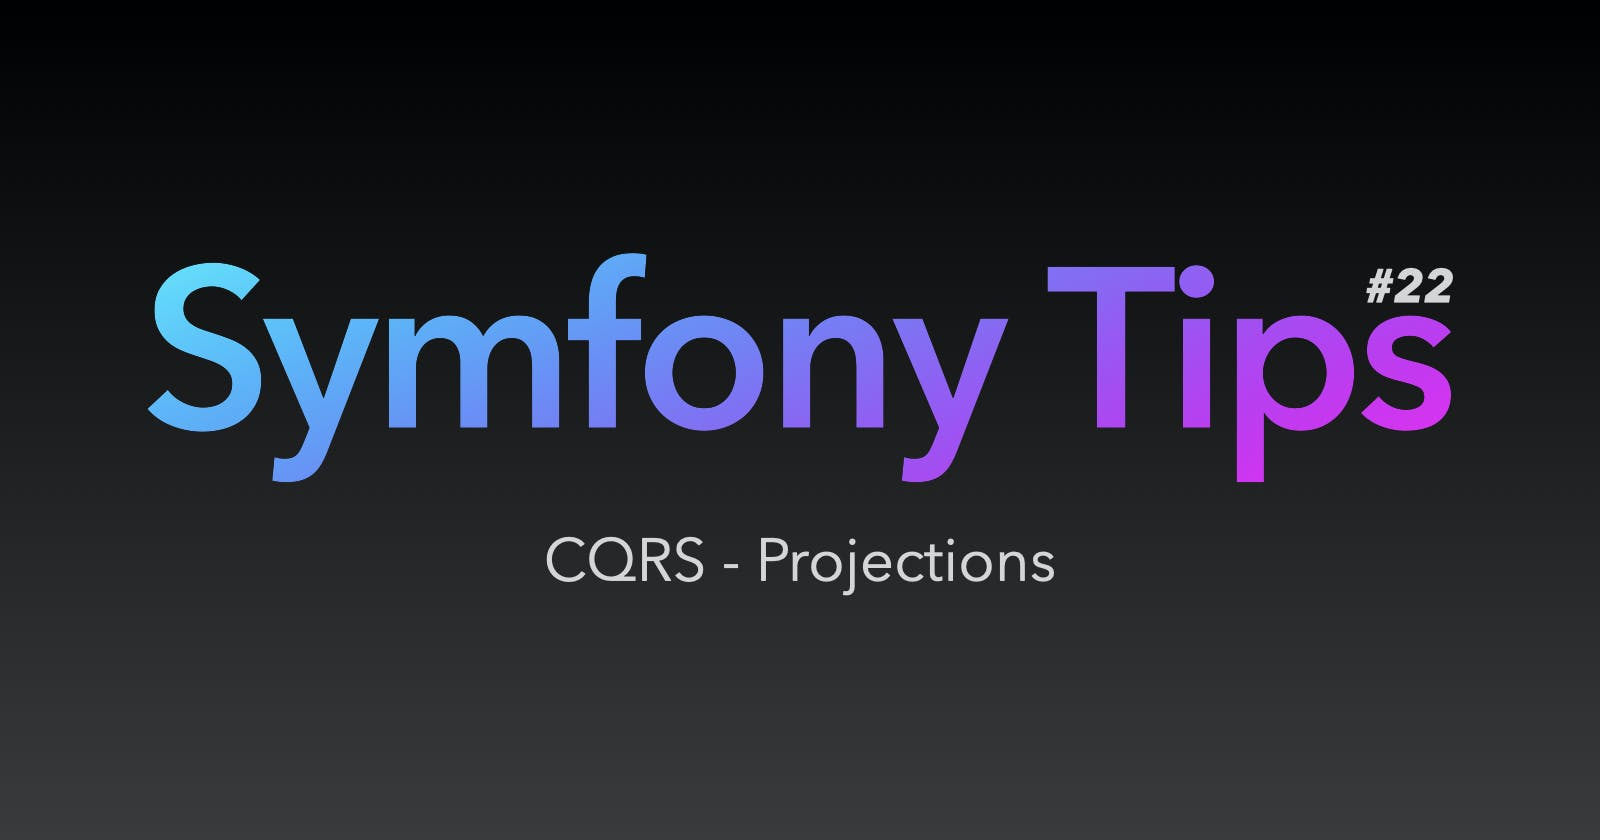 Symfony Tips #22 - CQRS - Projections